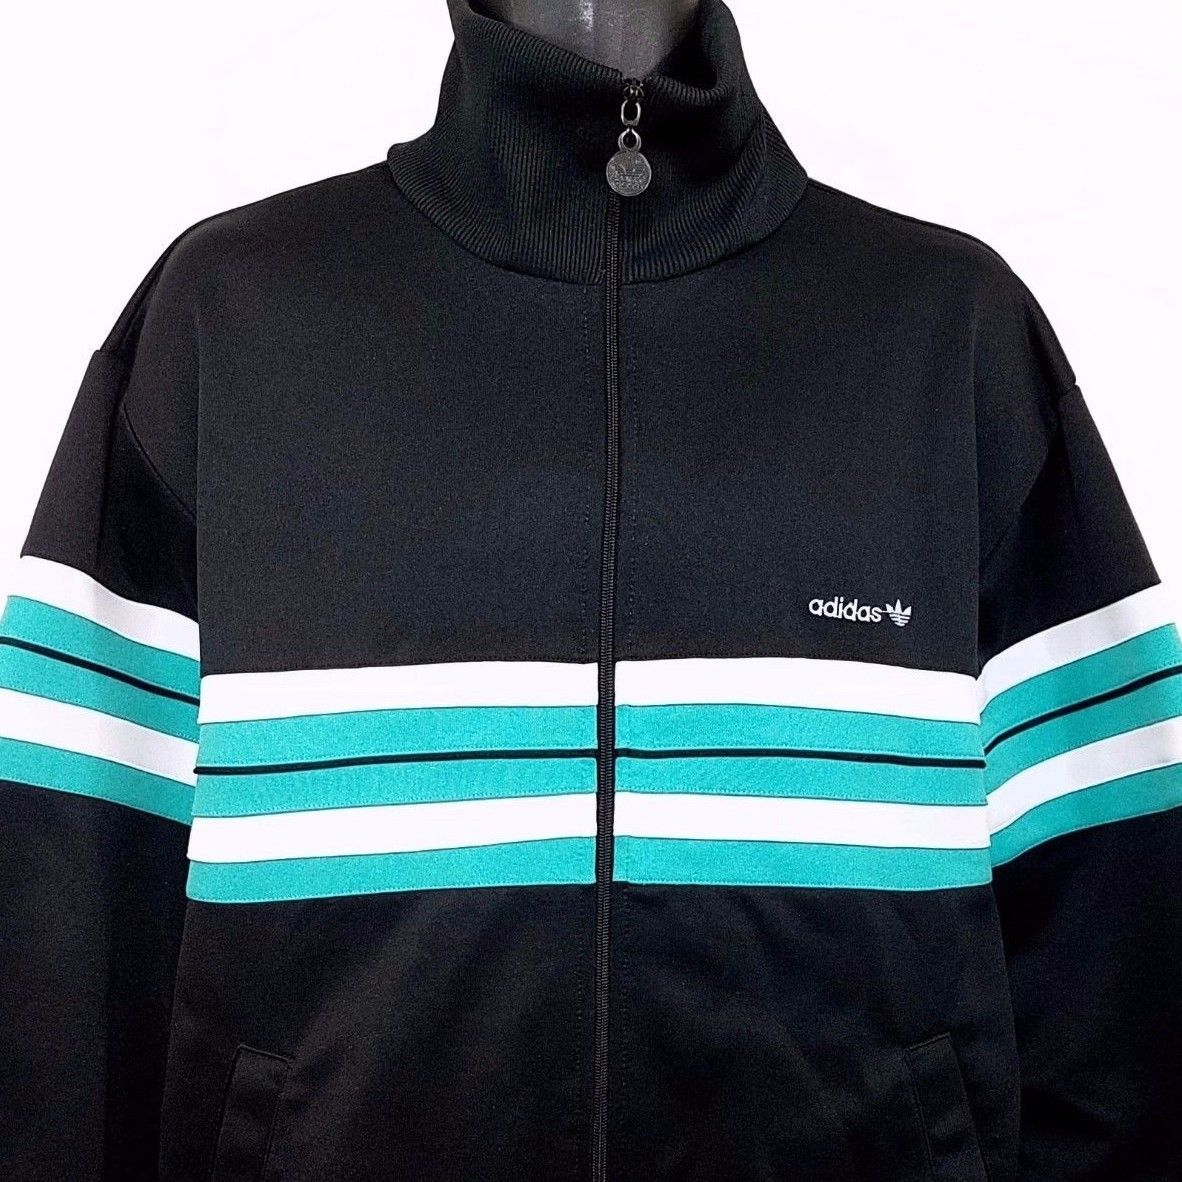 Adidas track jacket vtg s trefoil full zip mock neck black striped